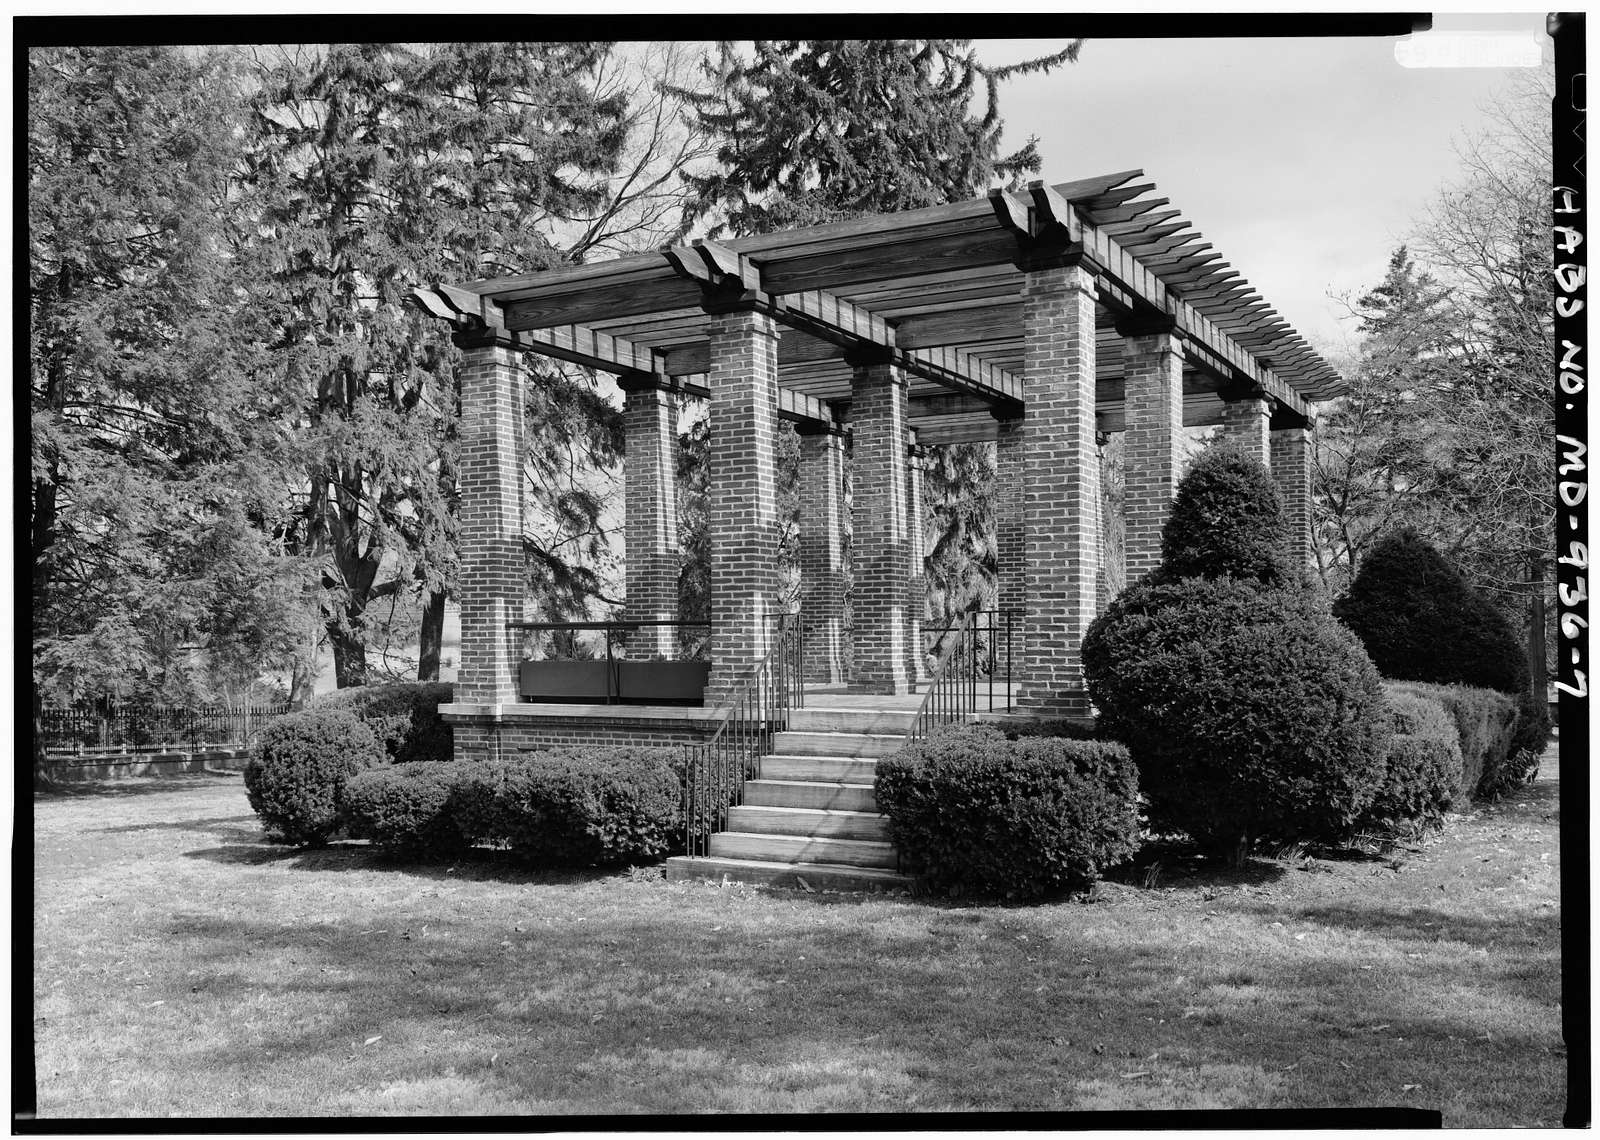 Antietam National Cemetery, Shepherdstown Pike (State Route 34), Sharpsburg, Washington County, MD